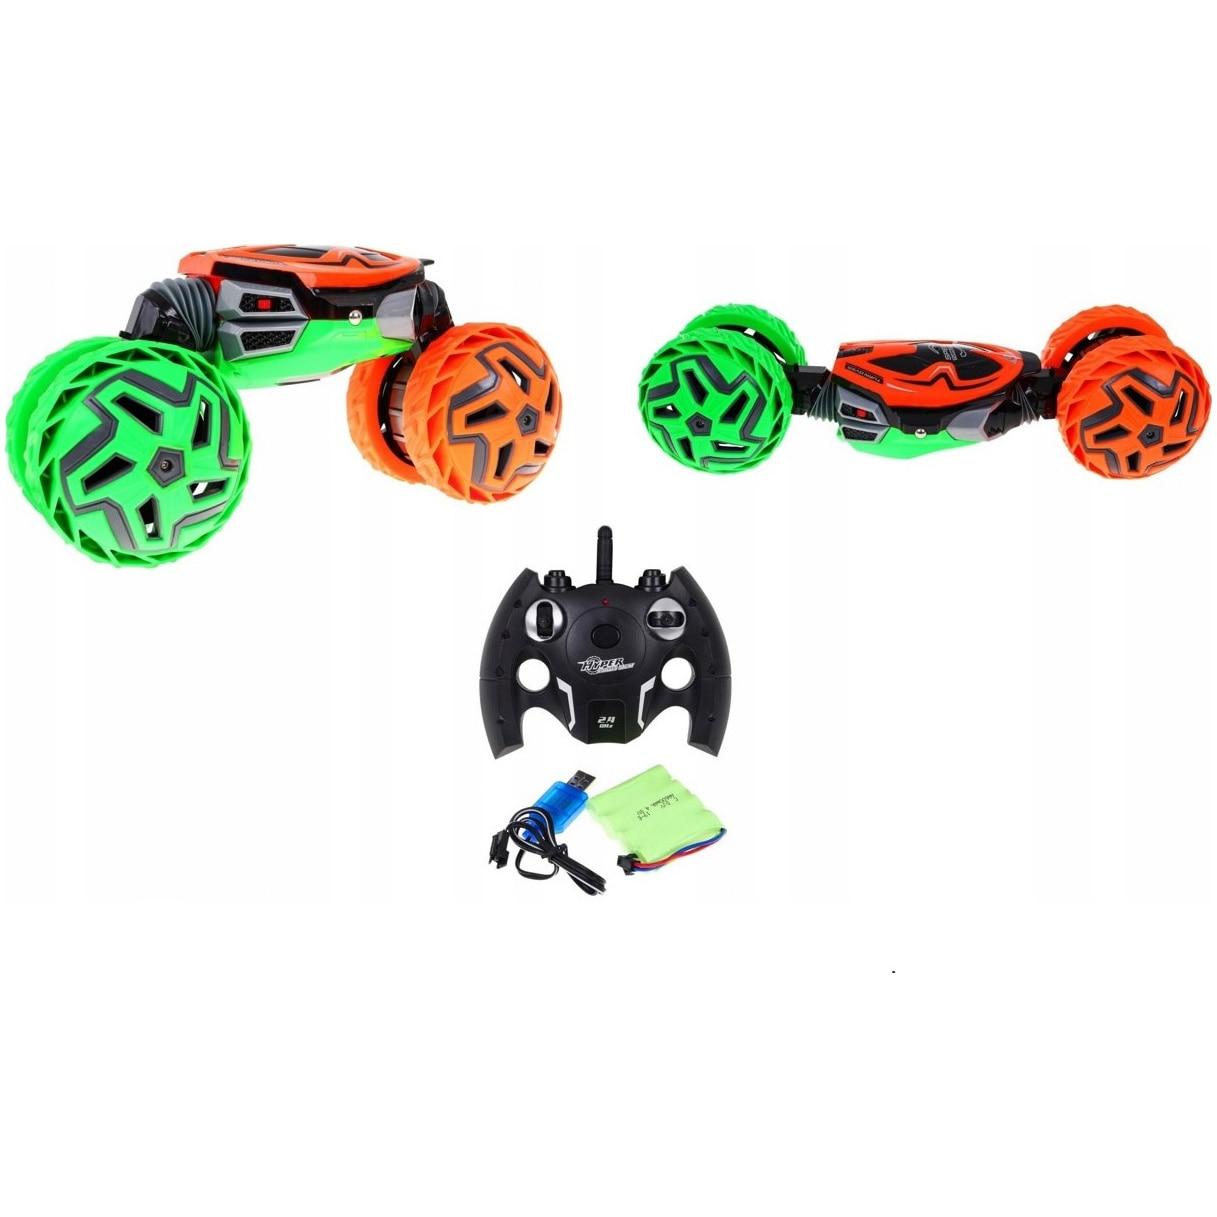 Fotografie Masinuta M-Toys cu telecomanda, Twist, Scala 1:12, Verde / Portocaliu